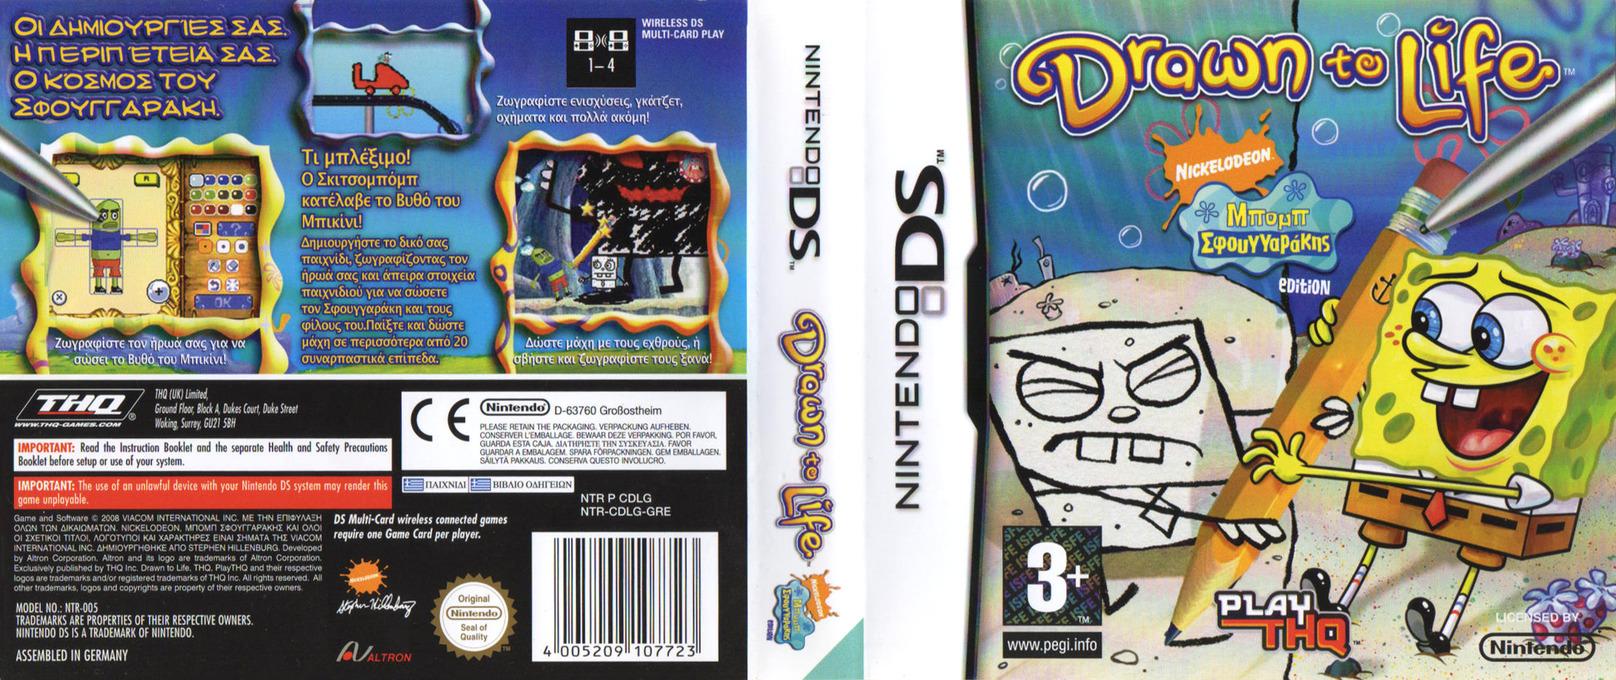 Drawn to Life - SpongeBob SquarePants Edition DS coverfullHQ (CDLG)